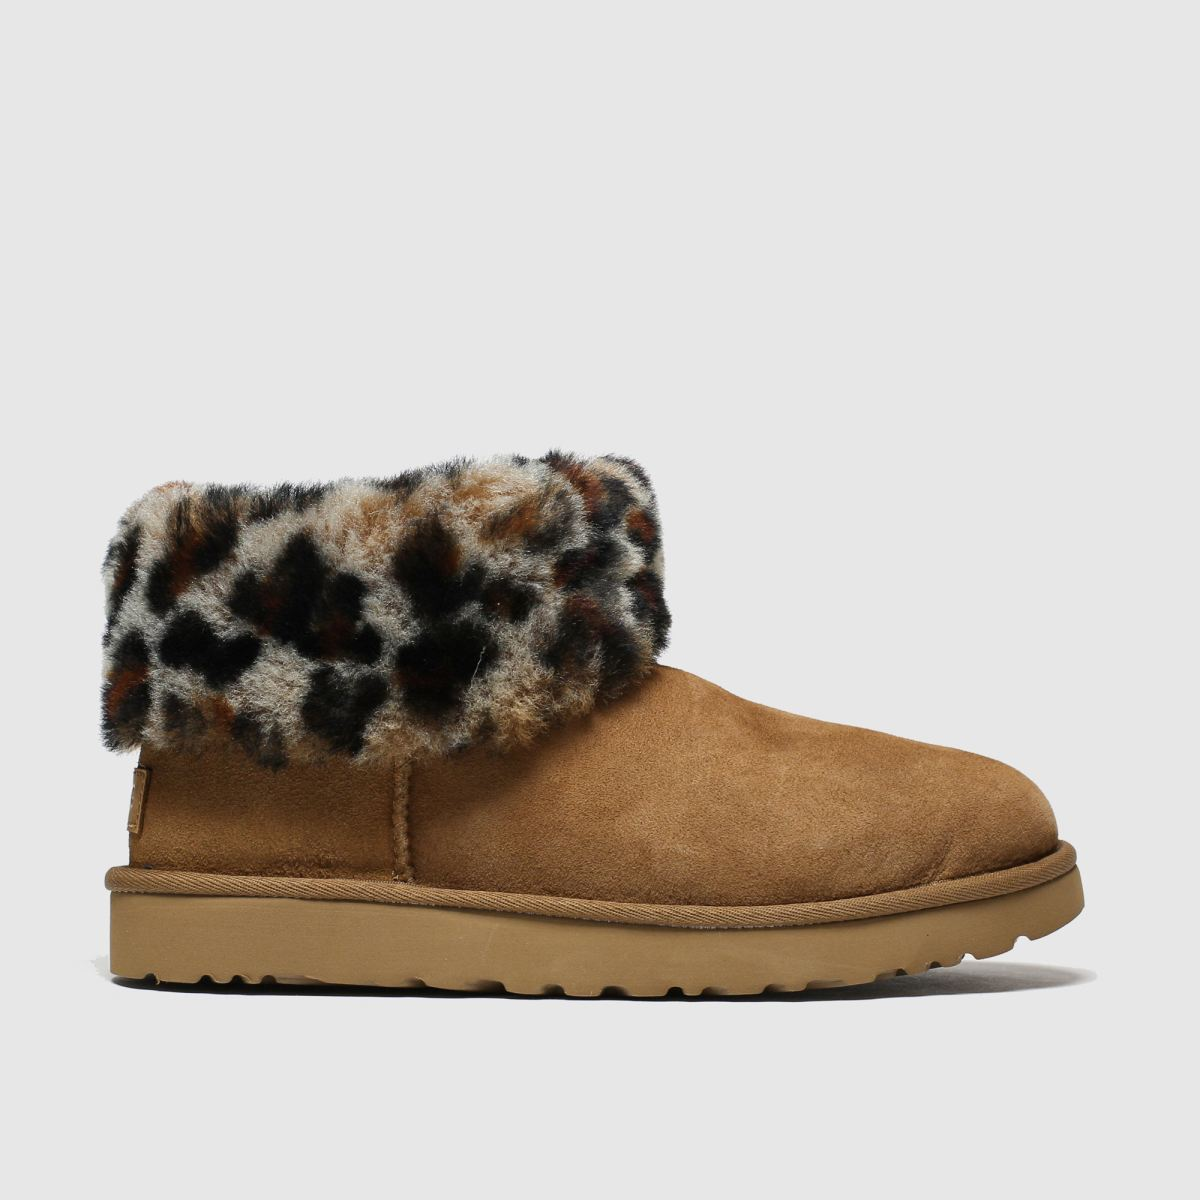 Ugg Brown & Black Classic Mini Fluff Boots